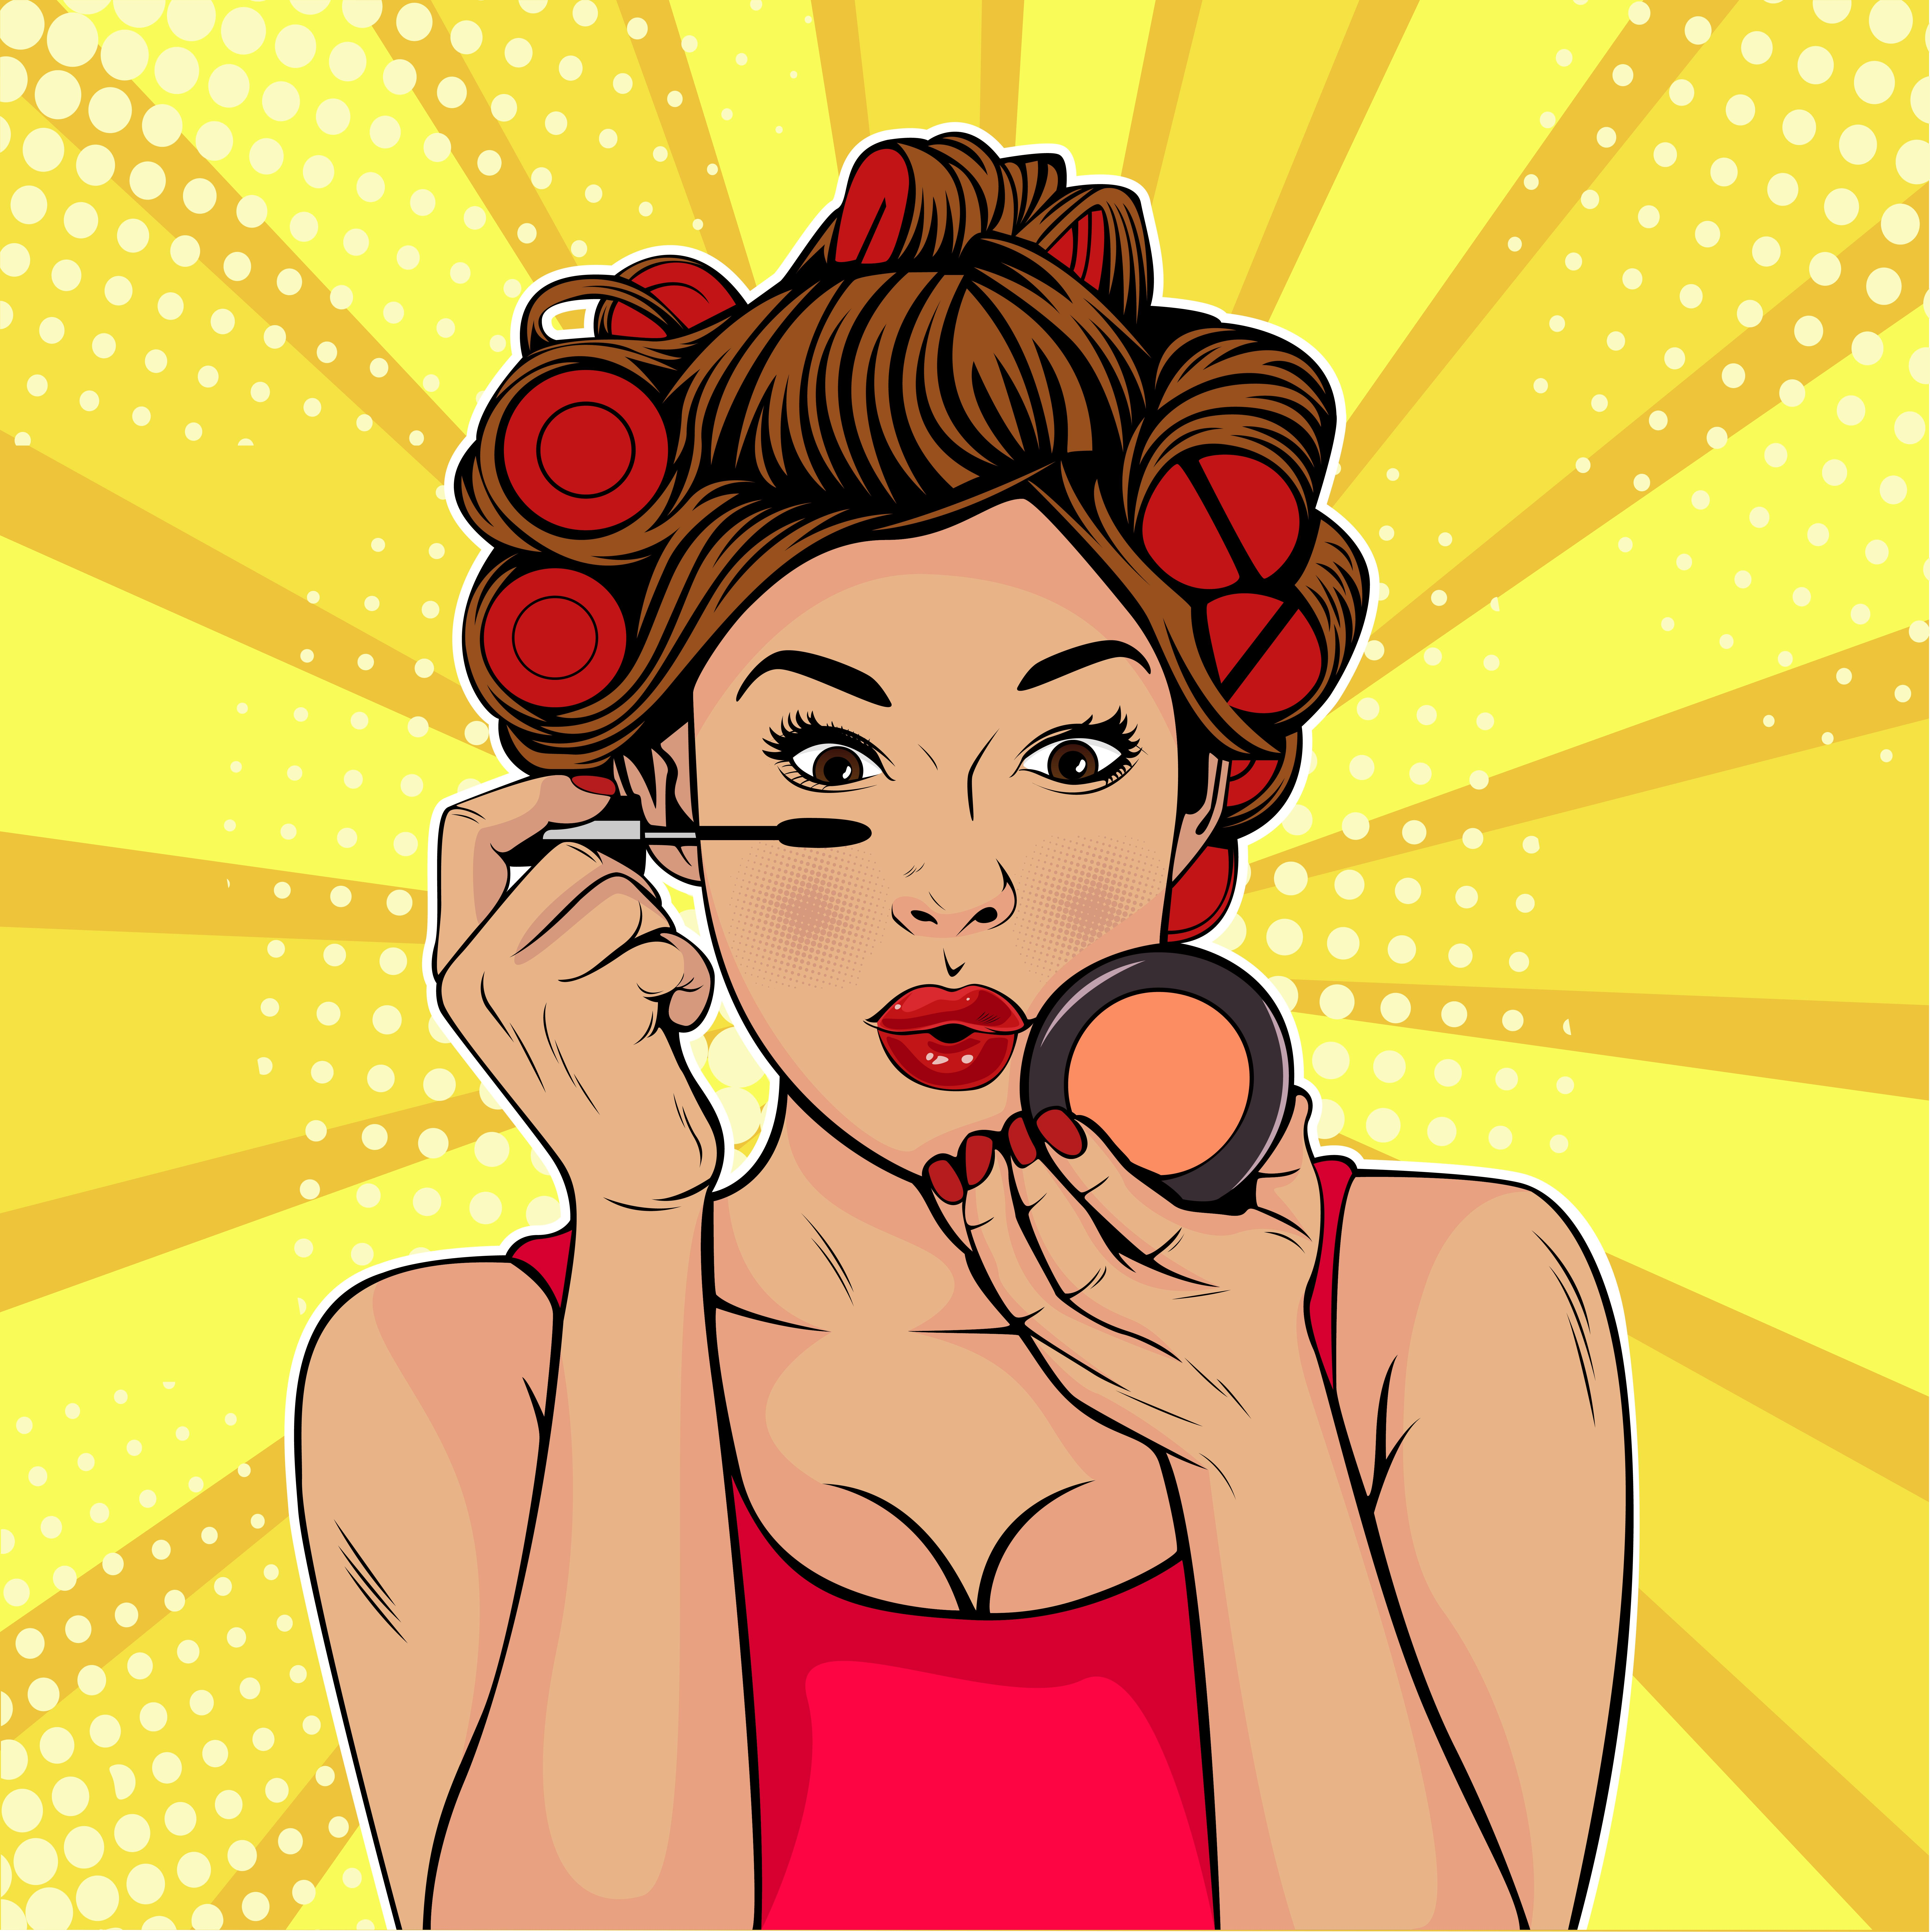 Girl Putting on Makeup Pop Art Style.